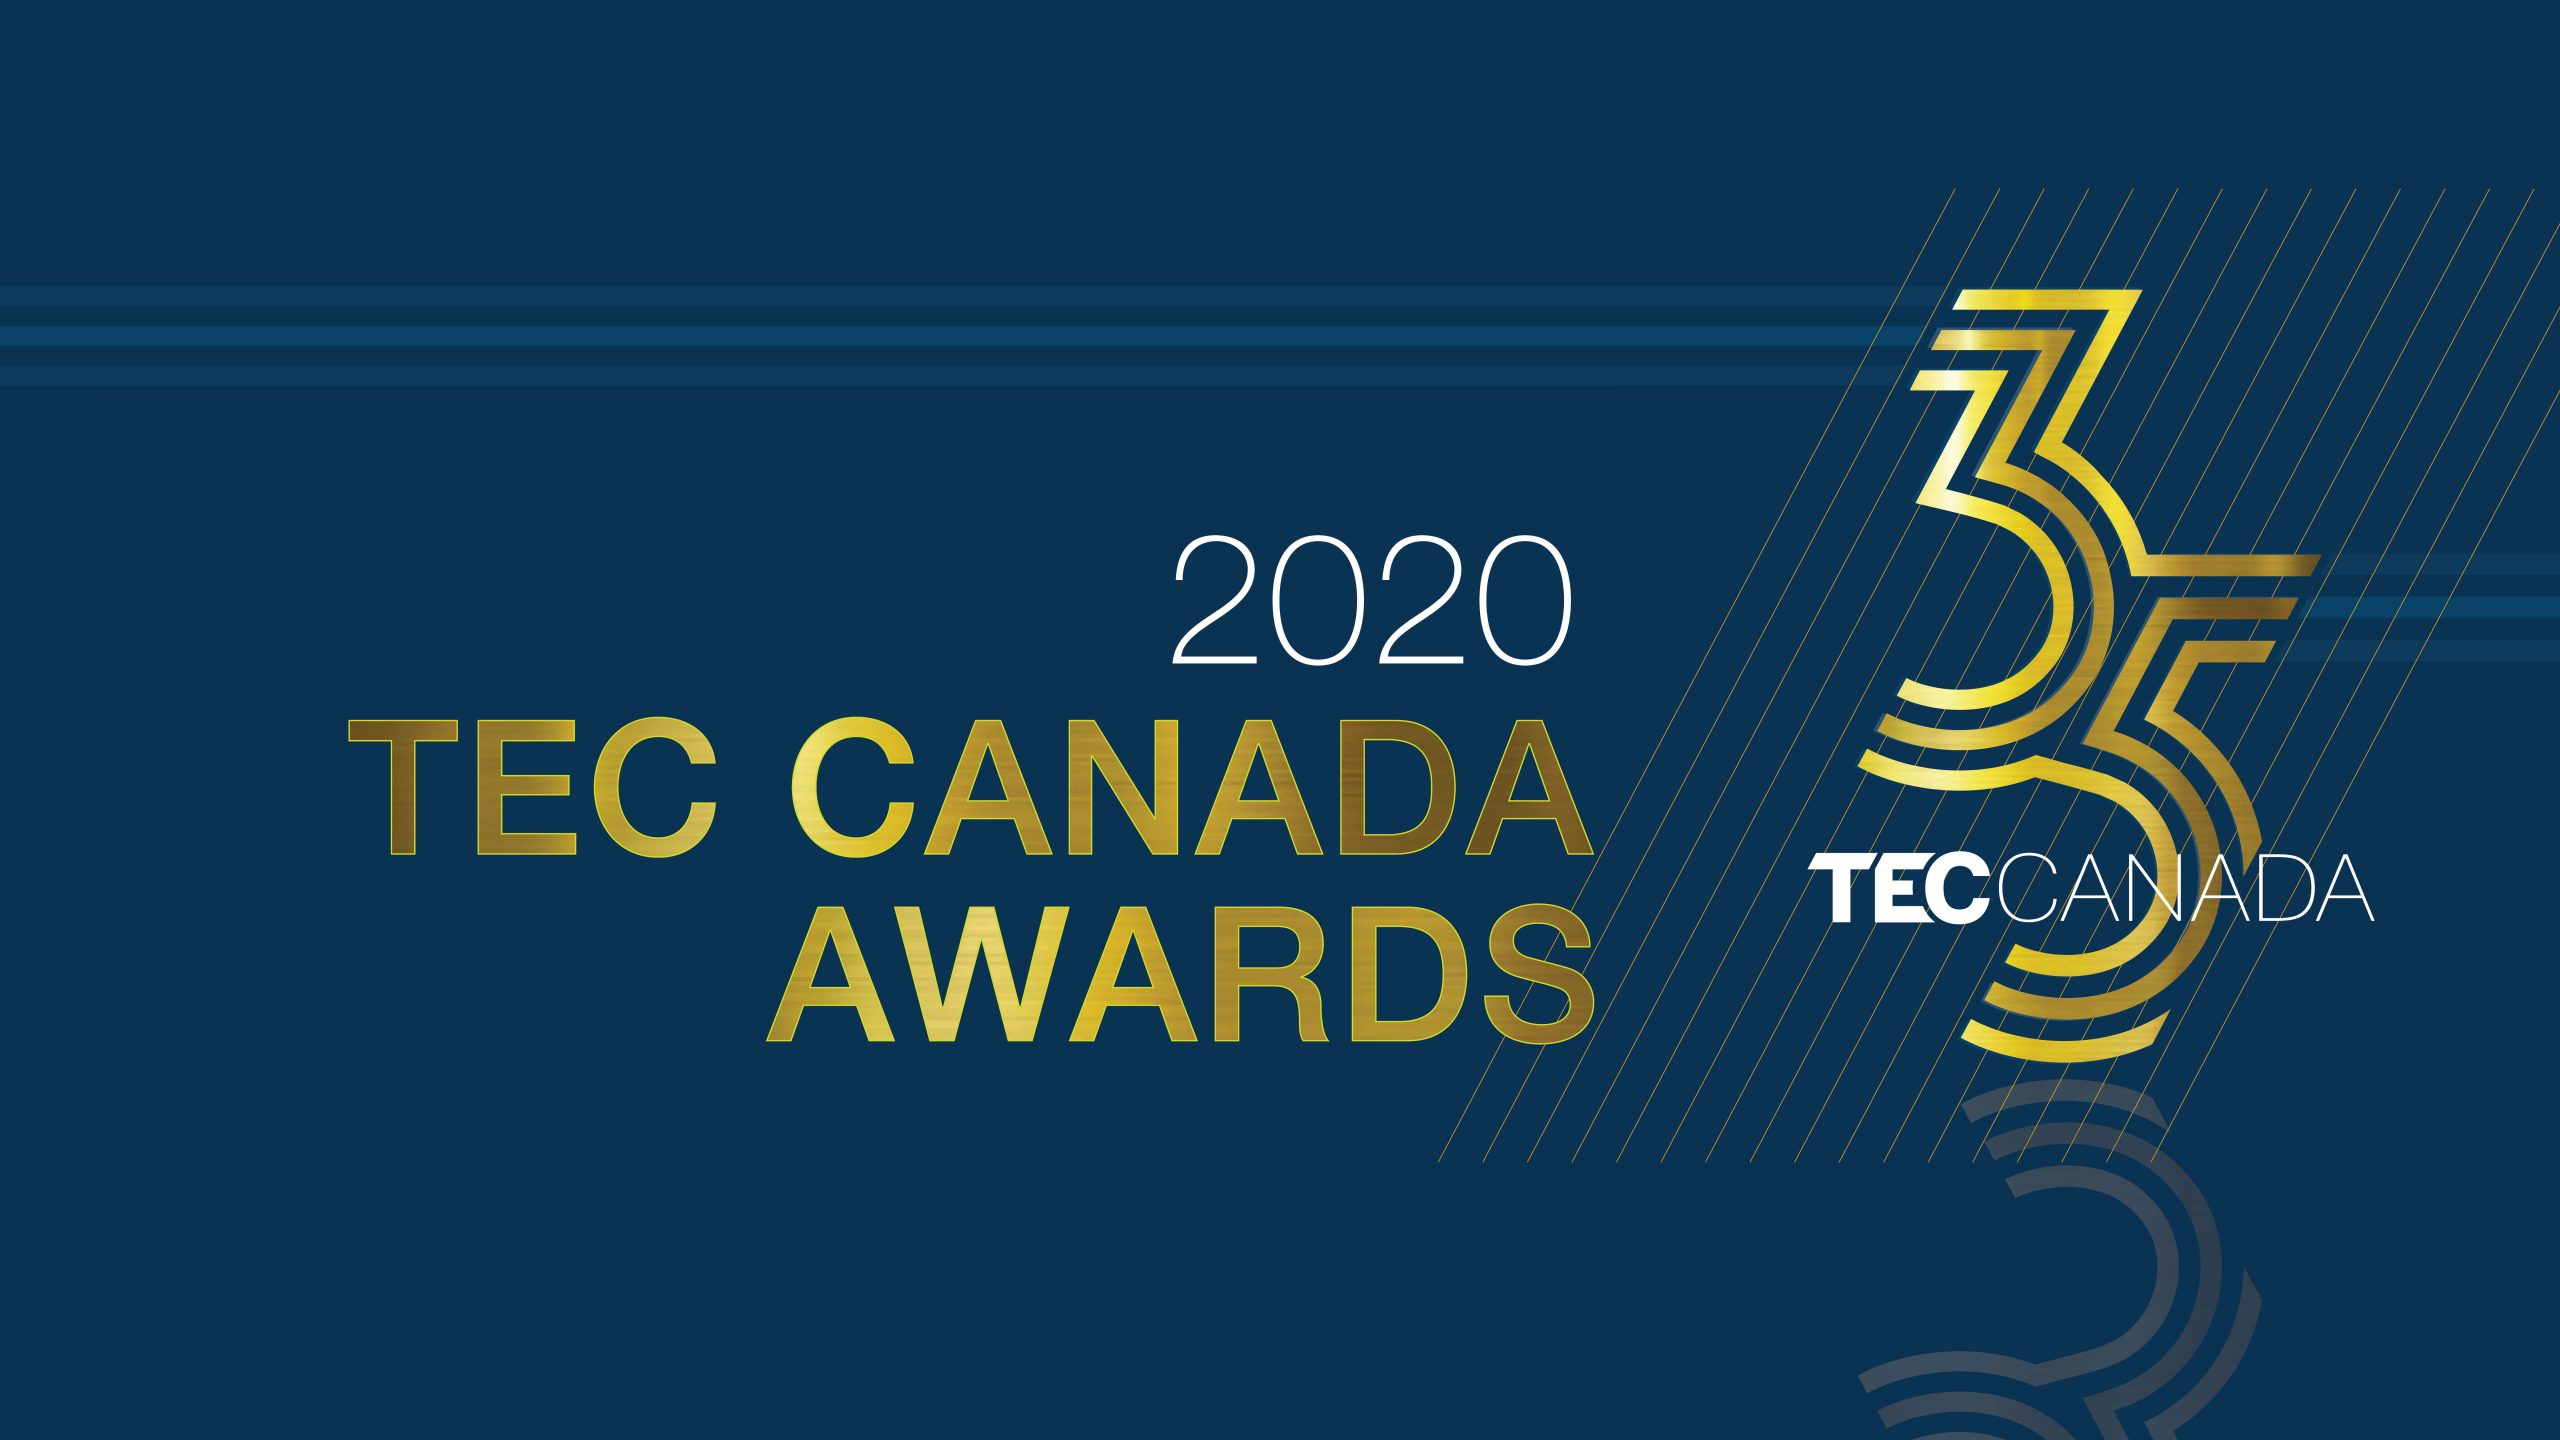 TEC Canada Awards